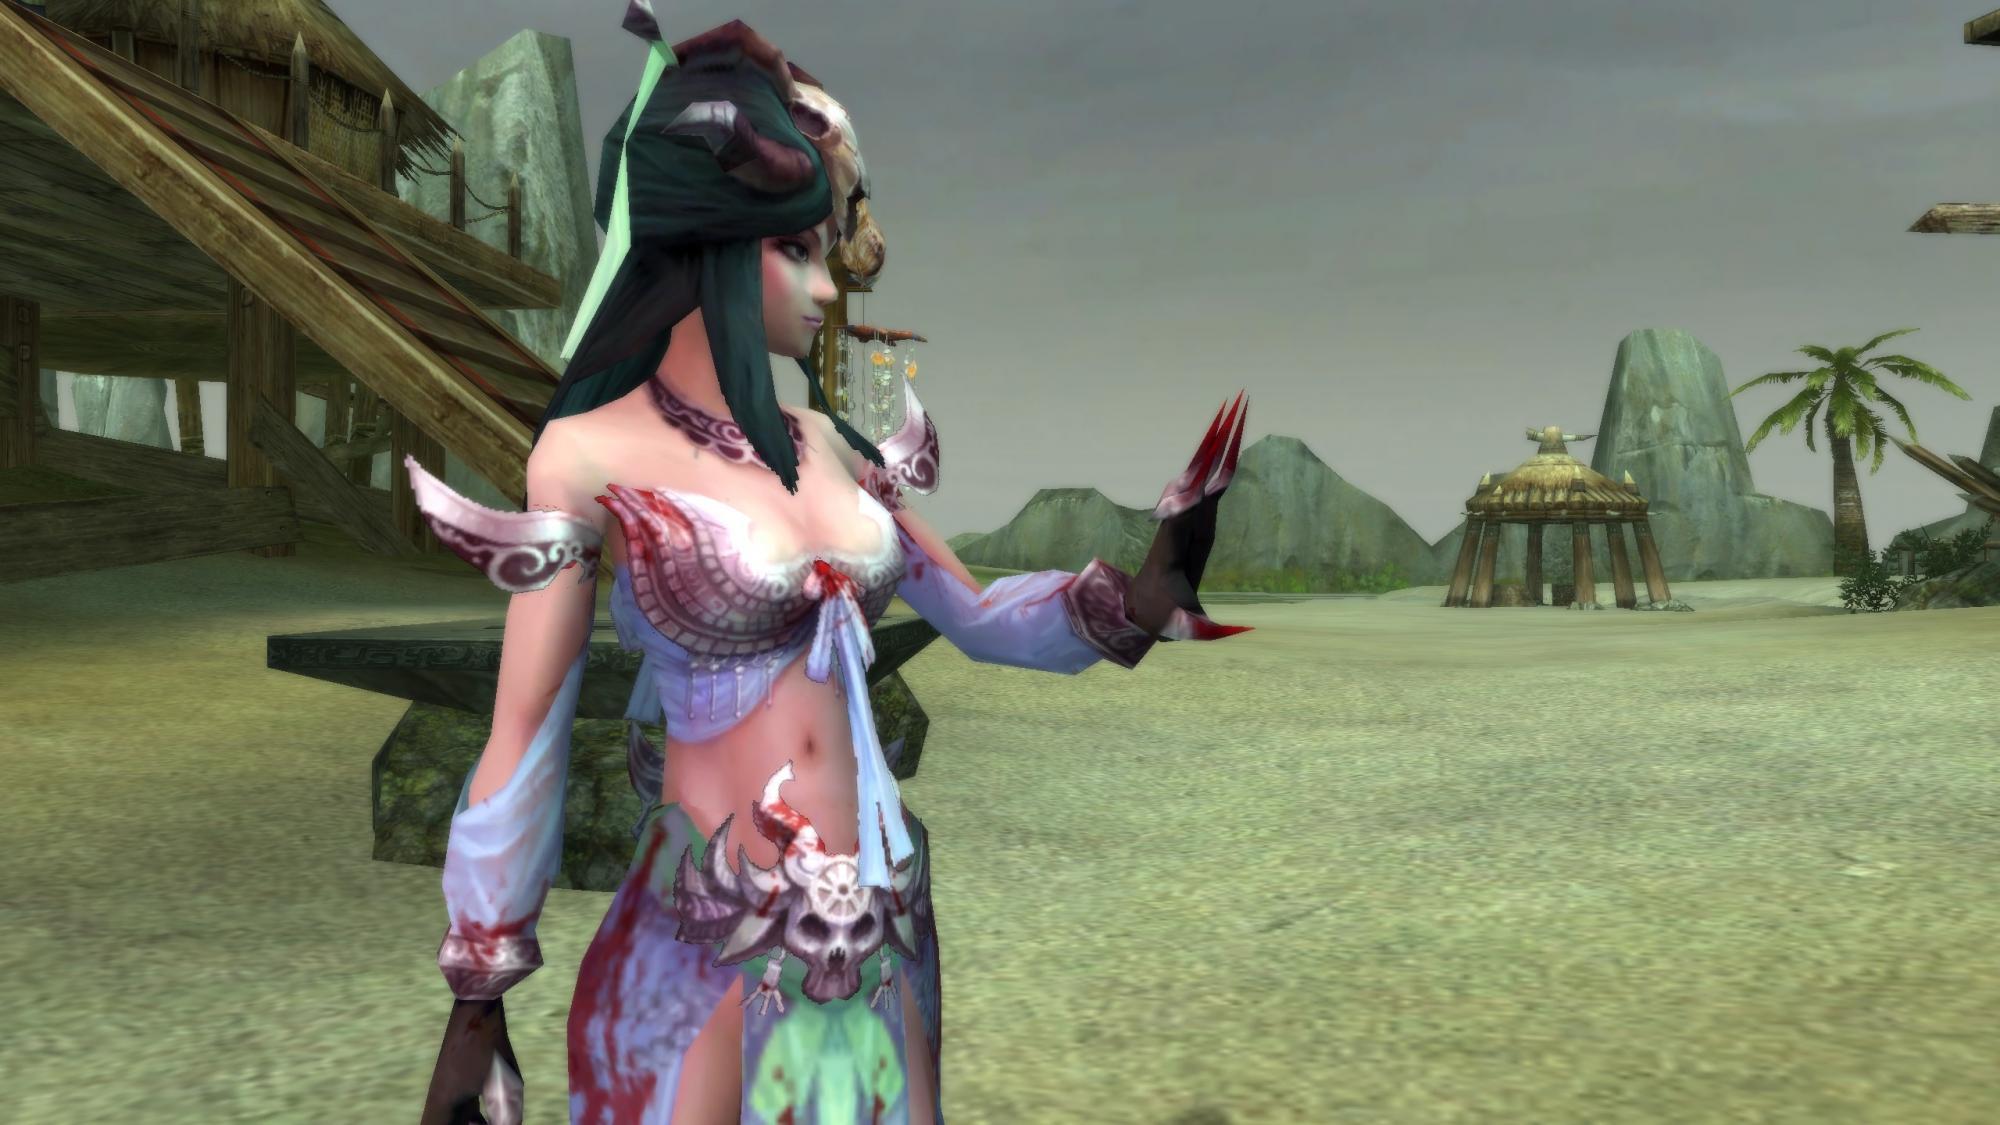 Click image for larger version.Name:Heroes of Three Kingdoms 3.jpgViews:164Size:211.5 KBID:799